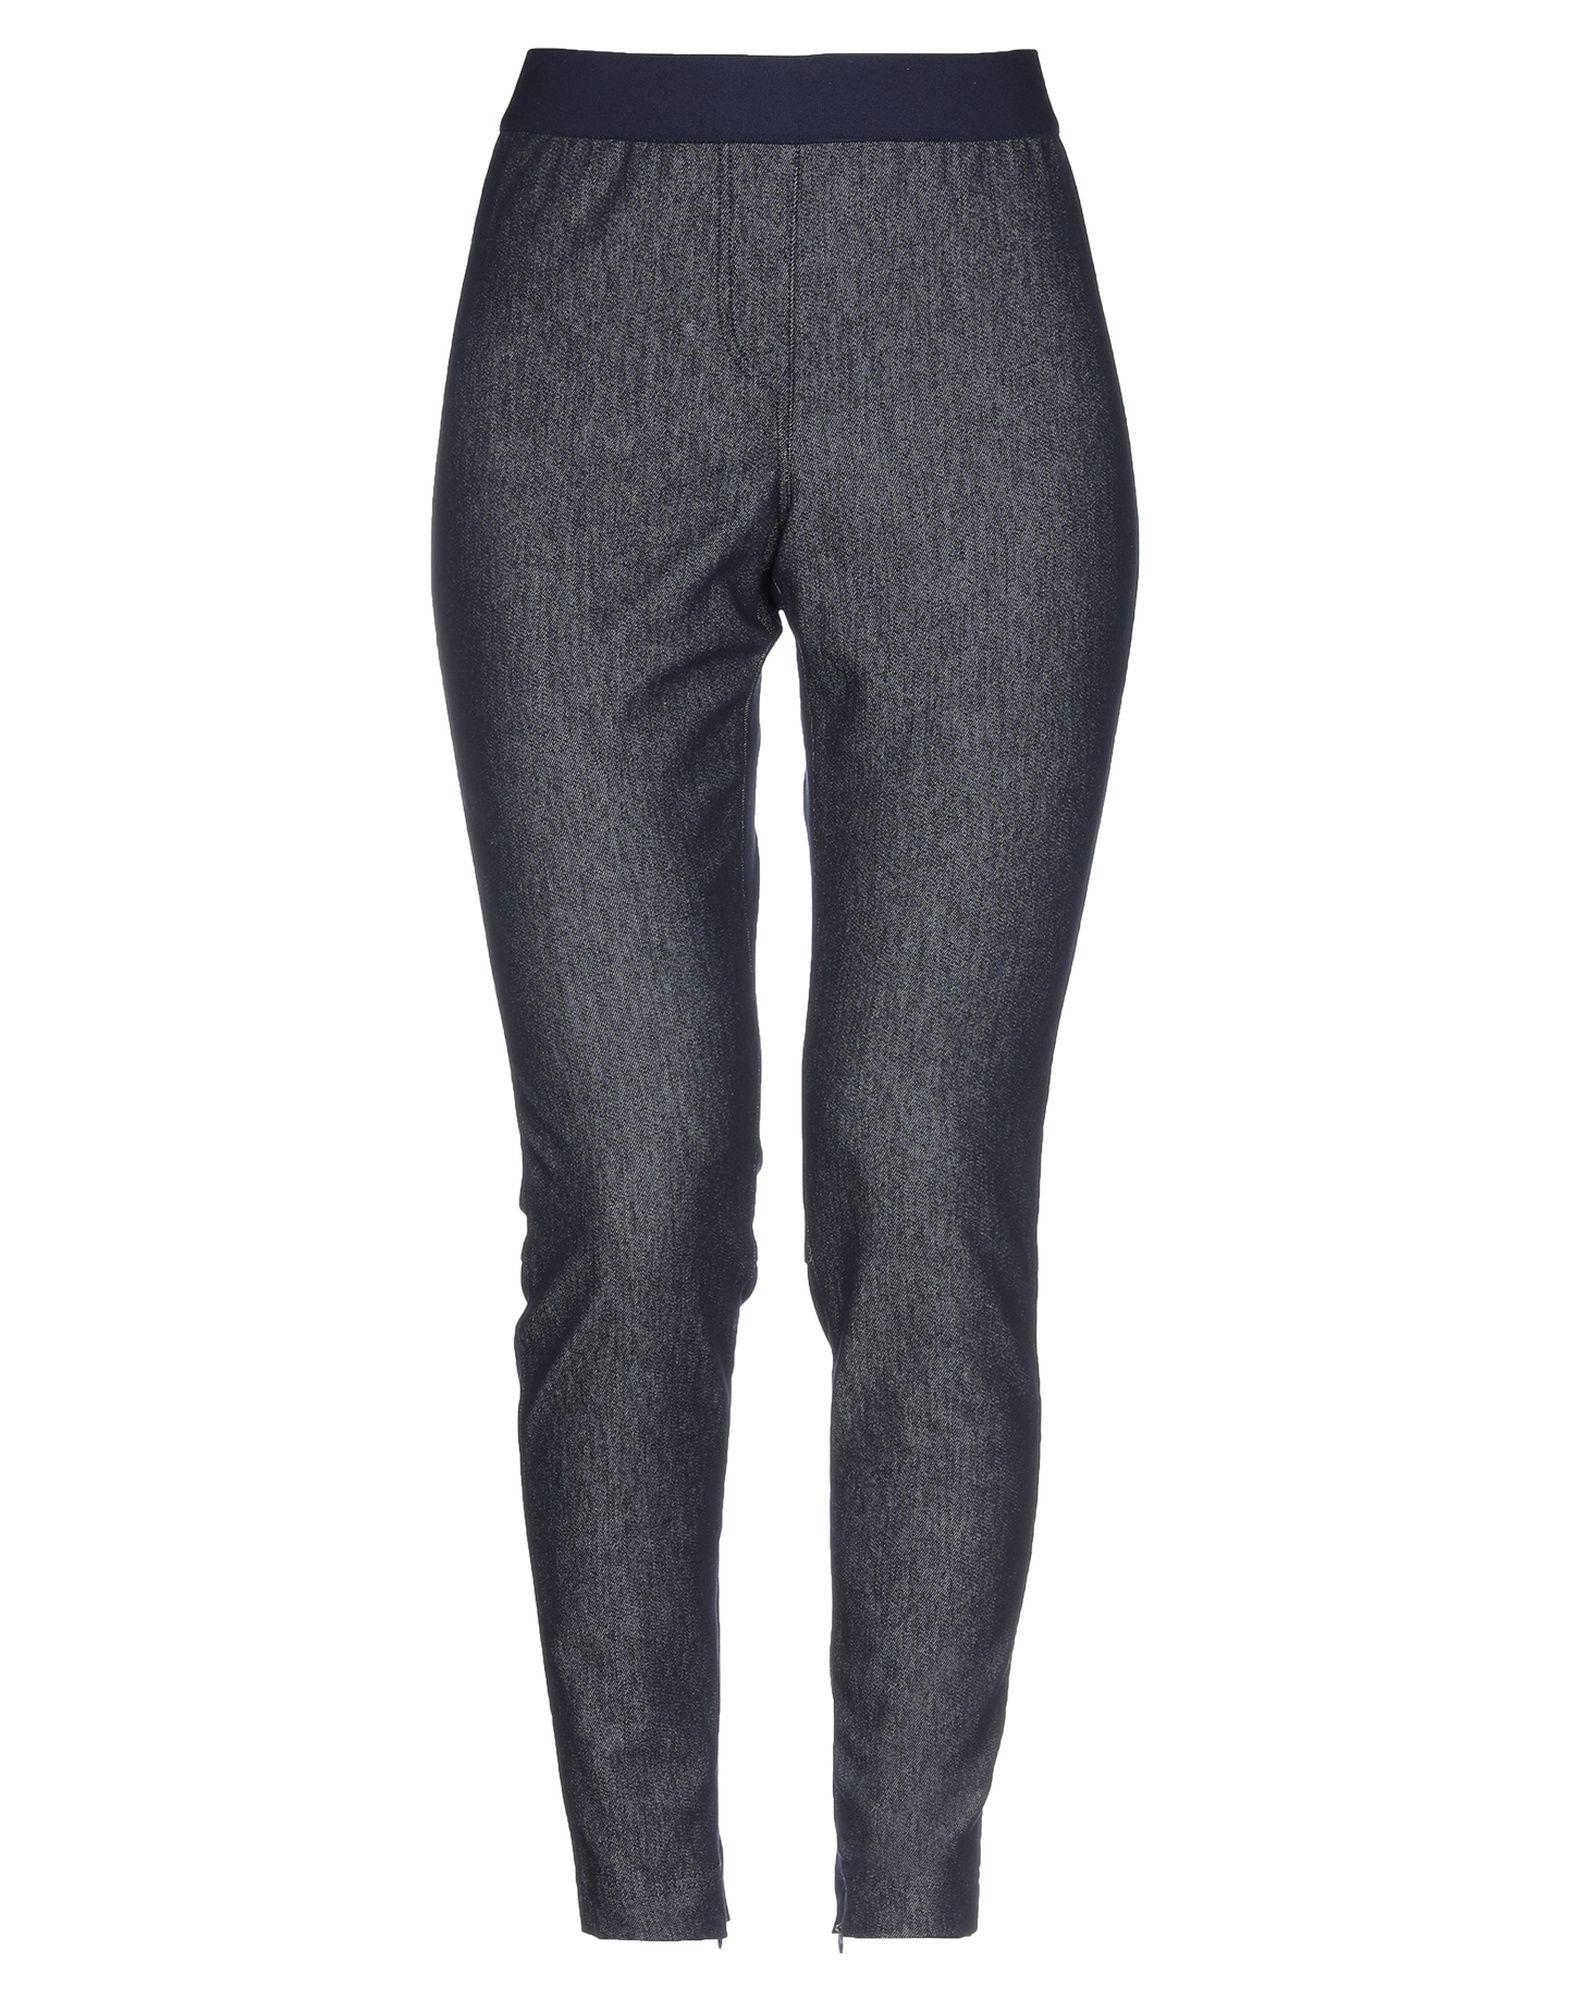 Фото - VDP CLUB Джинсовые брюки брюки vdp брюки